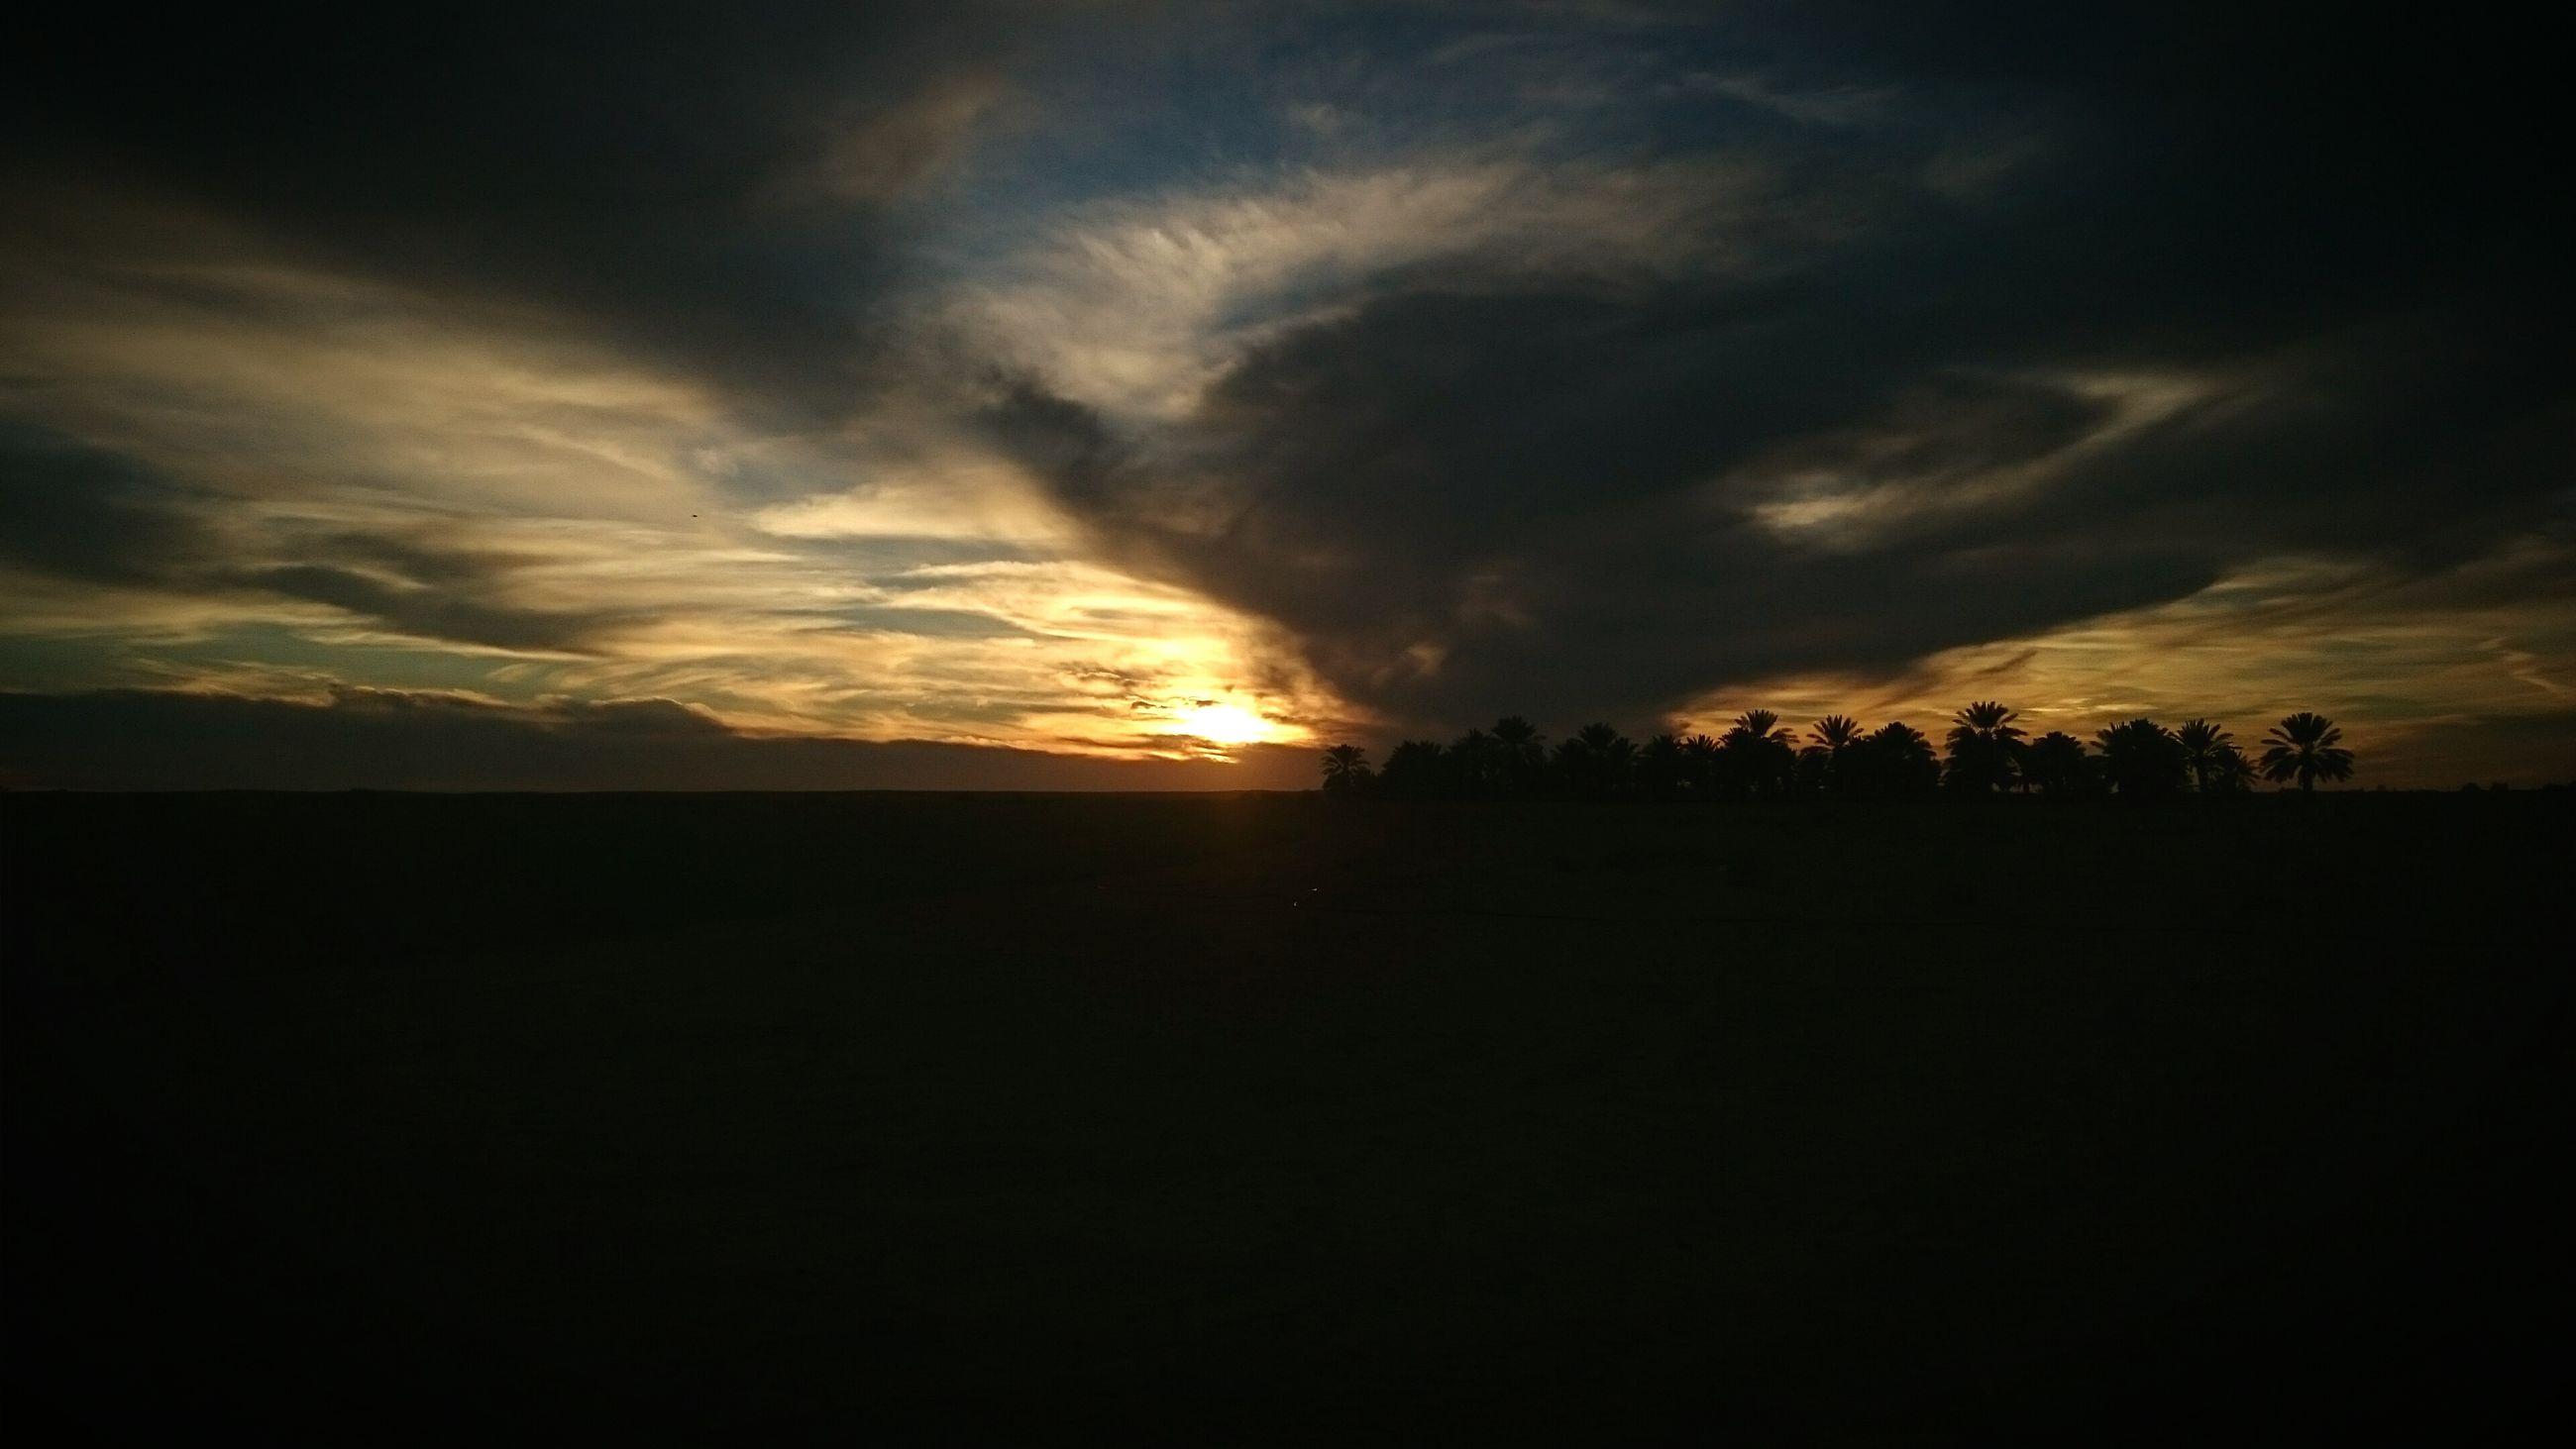 sunset, silhouette, scenics, tranquil scene, sky, tranquility, beauty in nature, cloud - sky, sun, landscape, idyllic, nature, orange color, dramatic sky, dark, cloudy, cloud, atmospheric mood, moody sky, outdoors